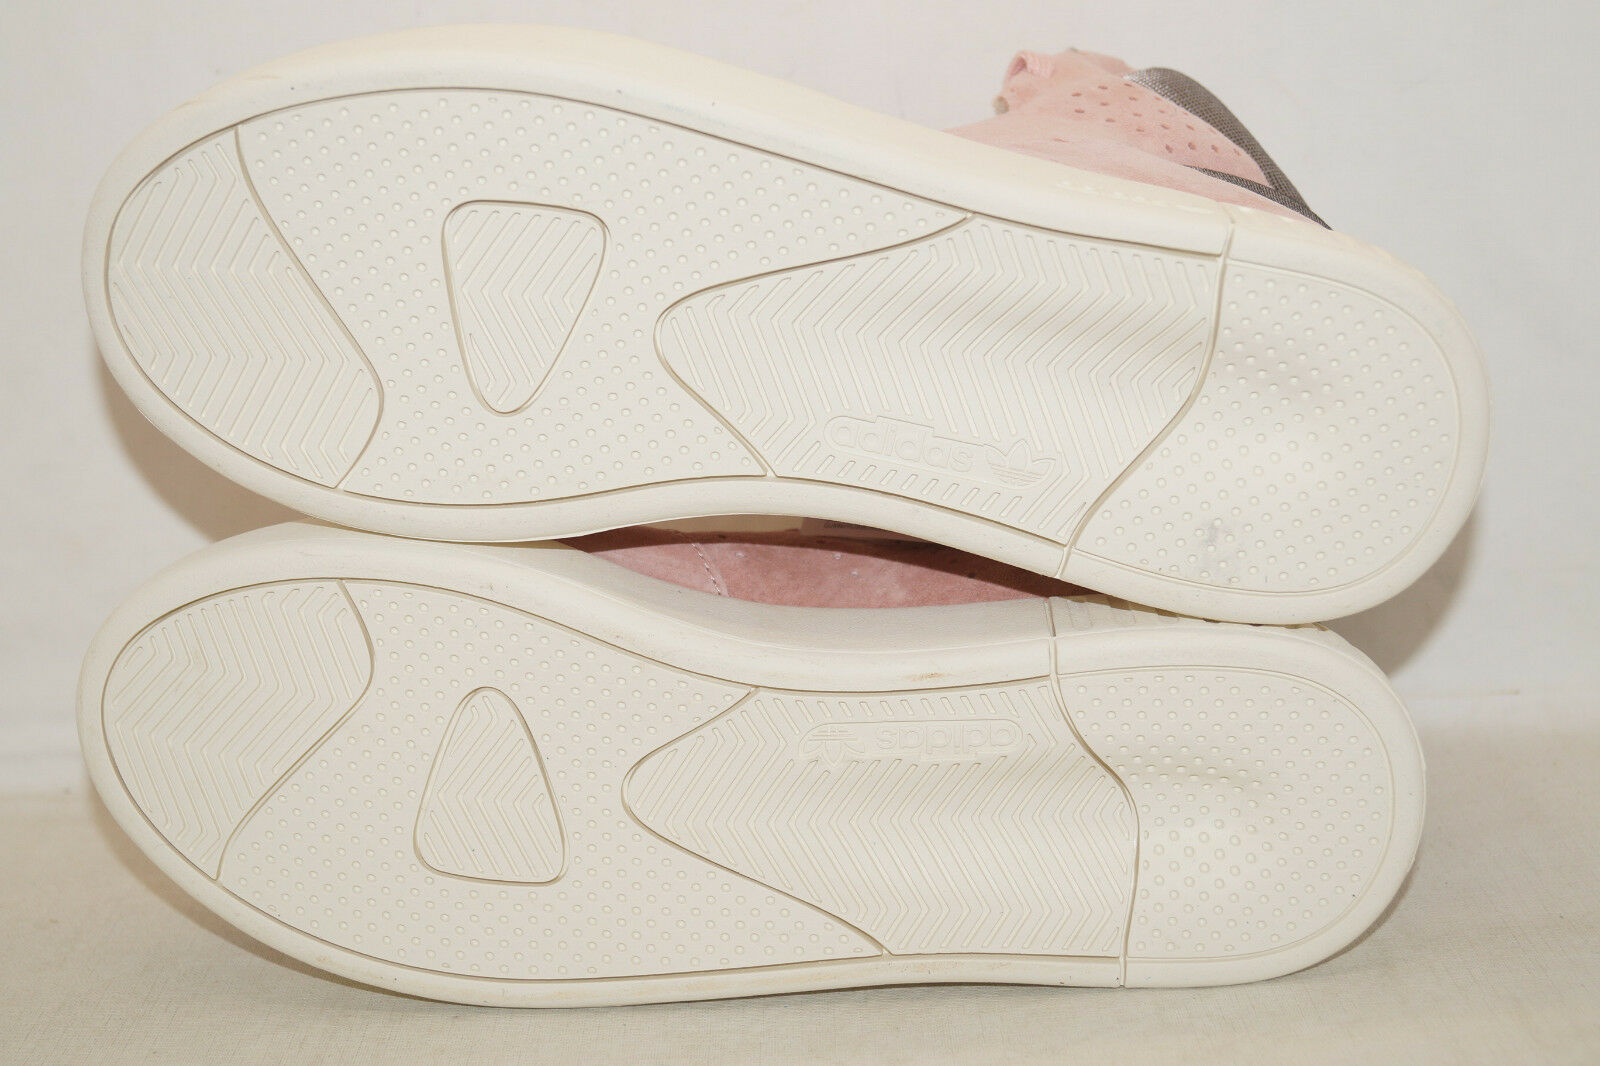 ADIDAS Originals Tubular Invader 2.0 2.0 2.0 W 38 rosa s80555 scarpe da ginnastica | Nuovo Arrivo  | Uomo/Donna Scarpa  b753f5